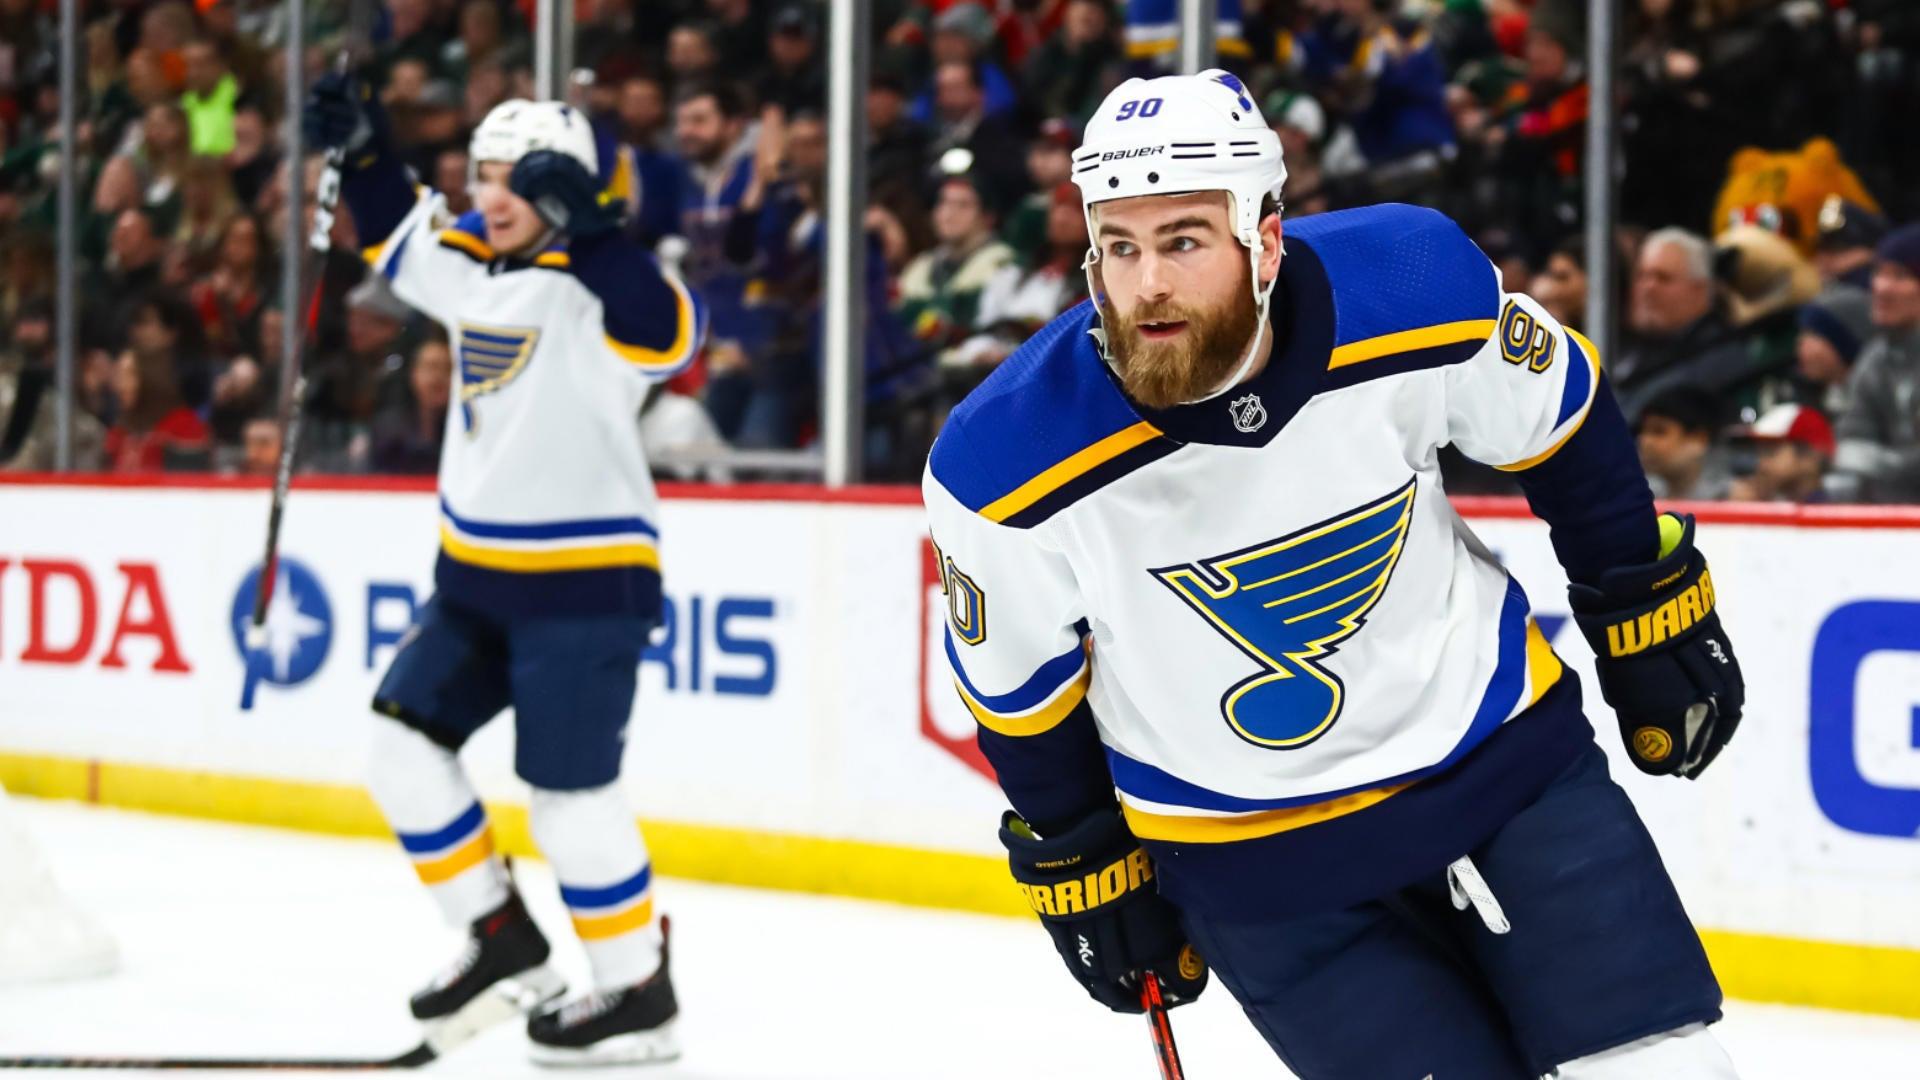 NHL trade deadline rumors: Bruins may make run at Mark Stone; Panthers may be eyeing Artemi Panarin in offseason